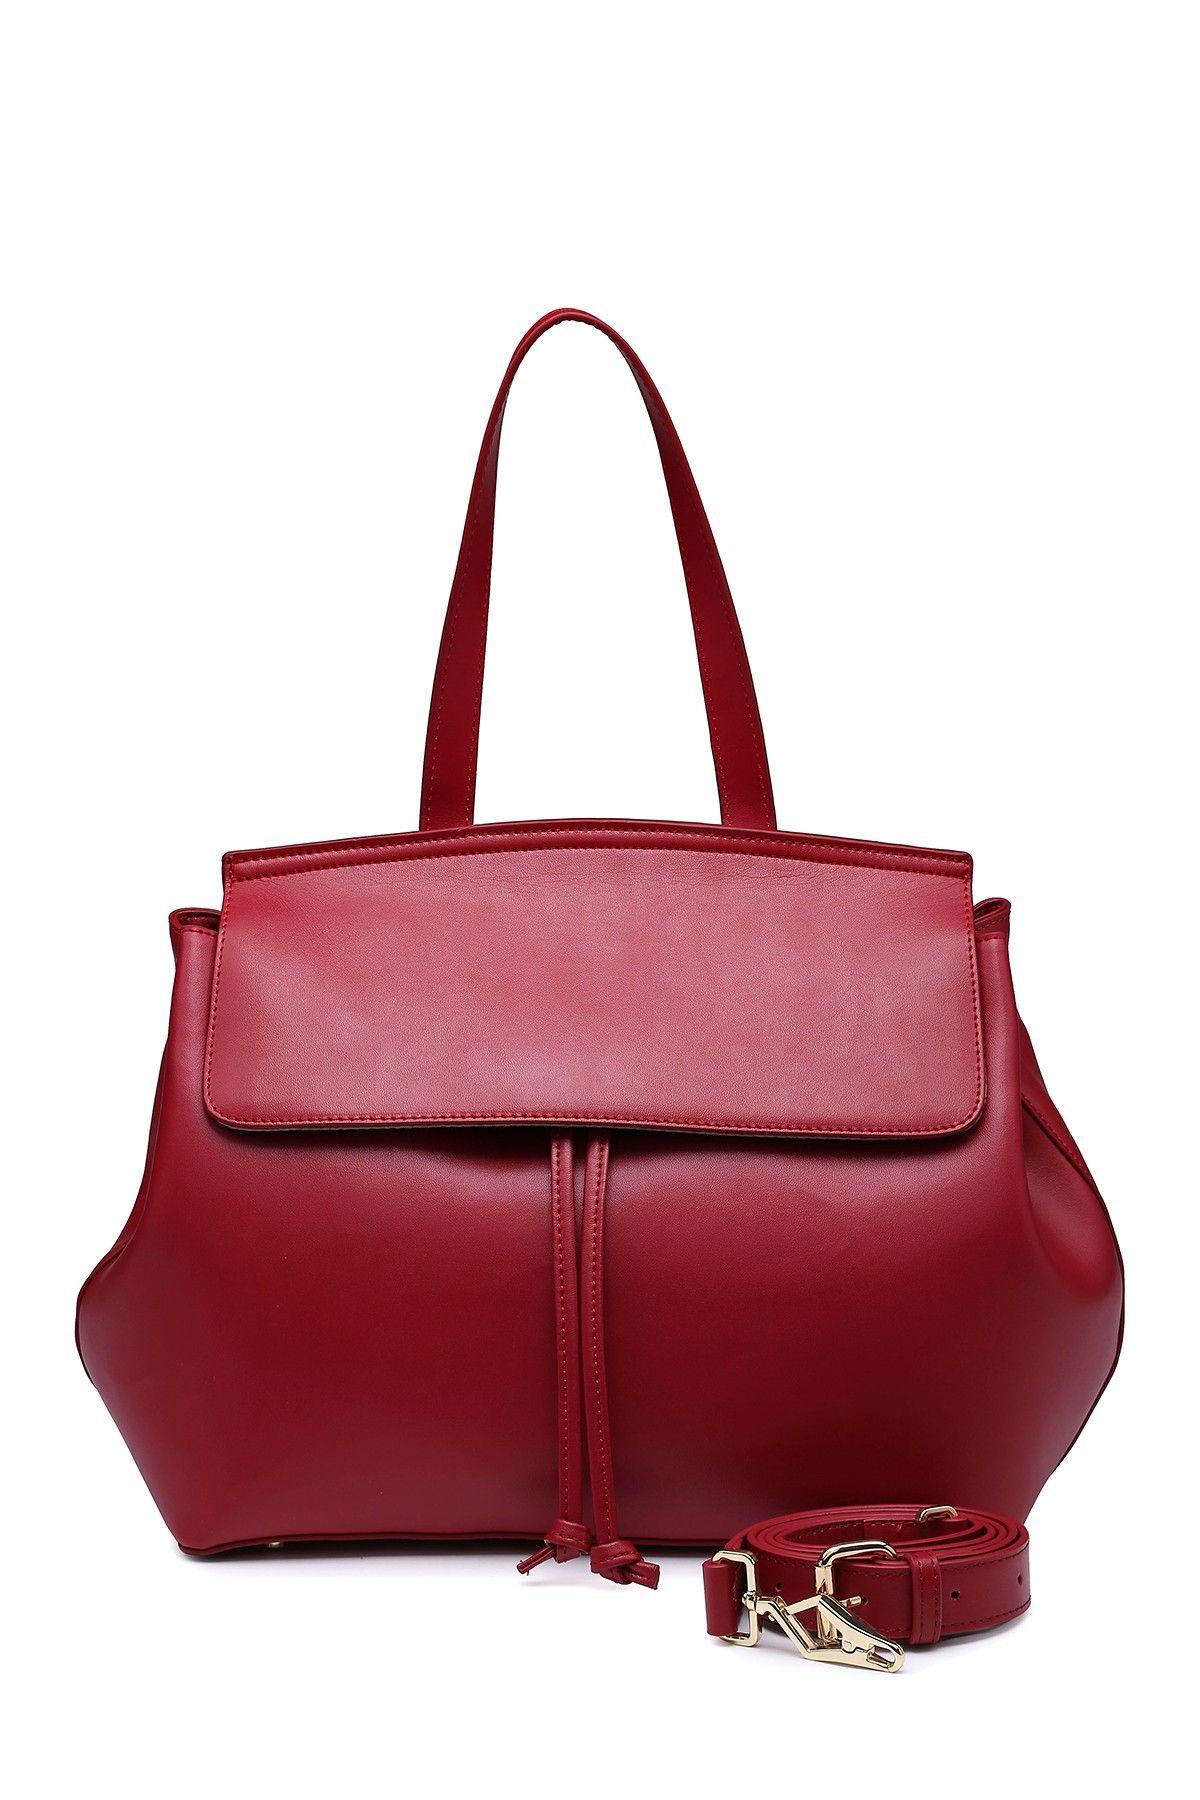 Segolene En Cuir Lacina Leather Satchel   Gel   Leather satchel ... 6666fce393